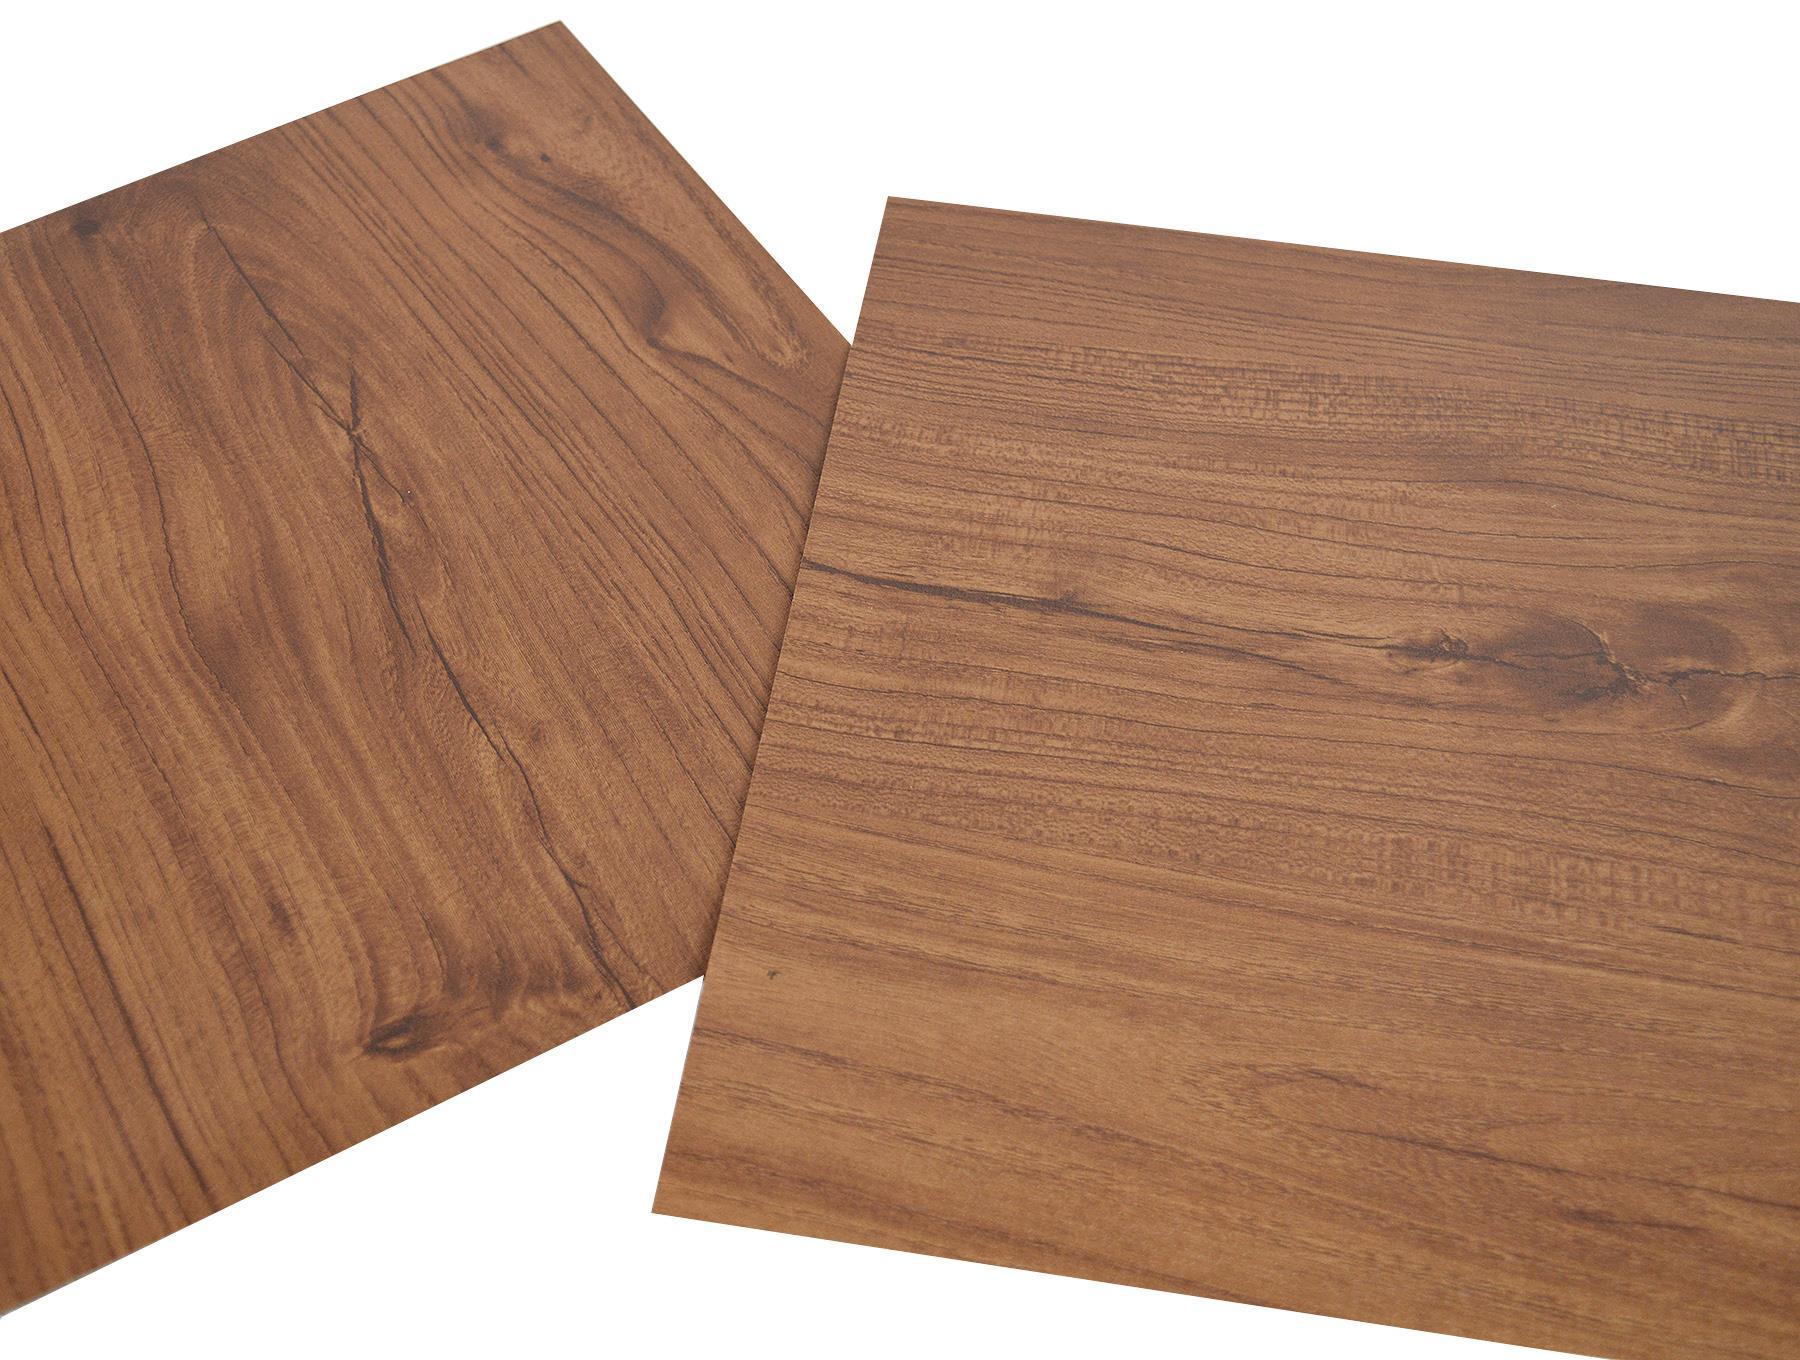 Floor-Tiles-Self-Adhesive-Vinyl-Flooring-Kitchen-Bathroom-Brown-Wood-Grain thumbnail 11